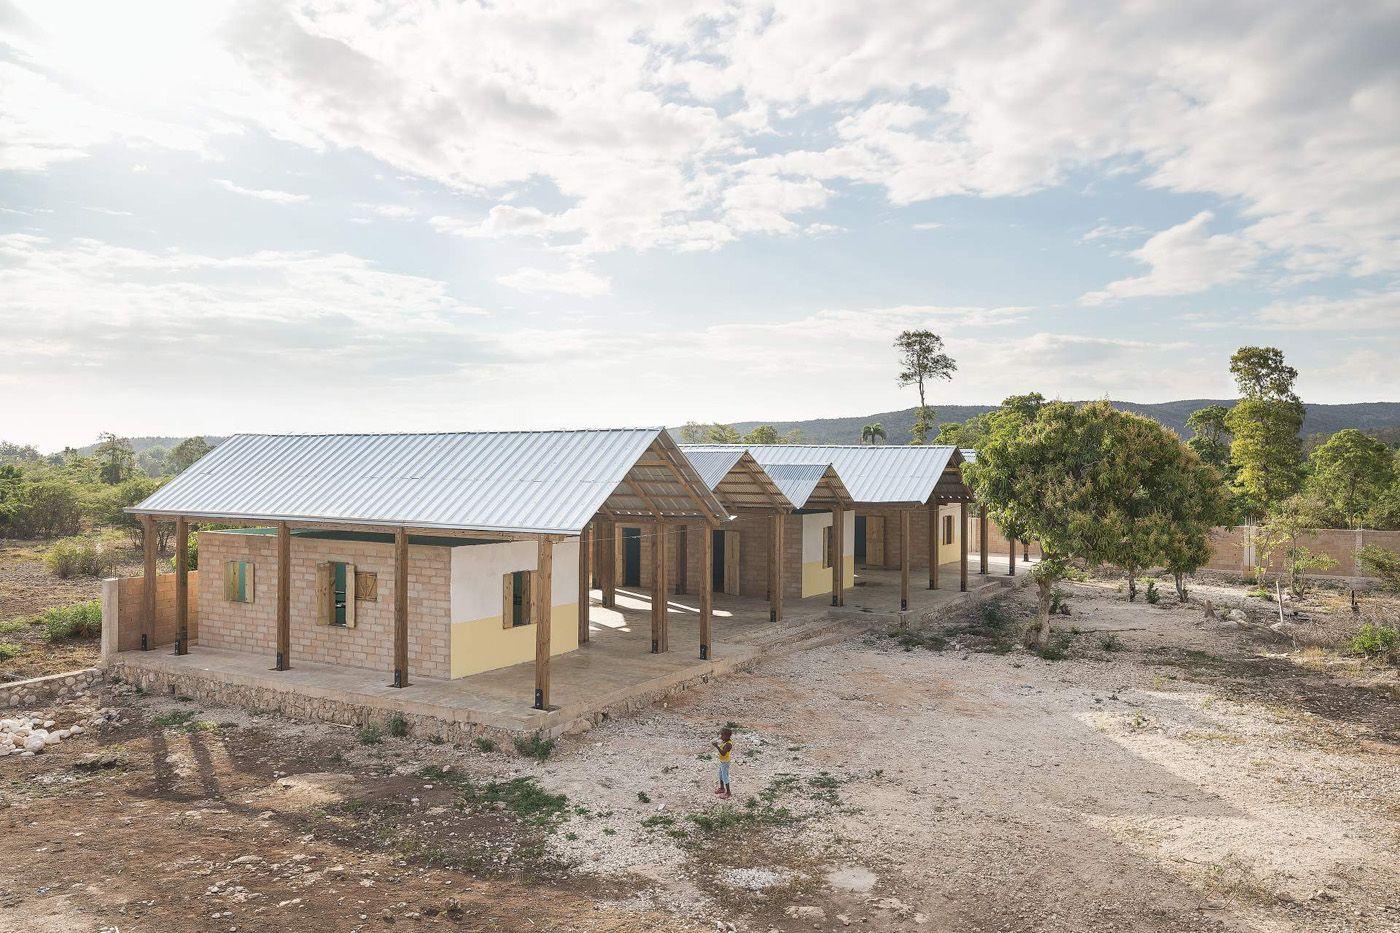 Vista exterior. Horfanato en Haití por Bonaventura Visconti di ...